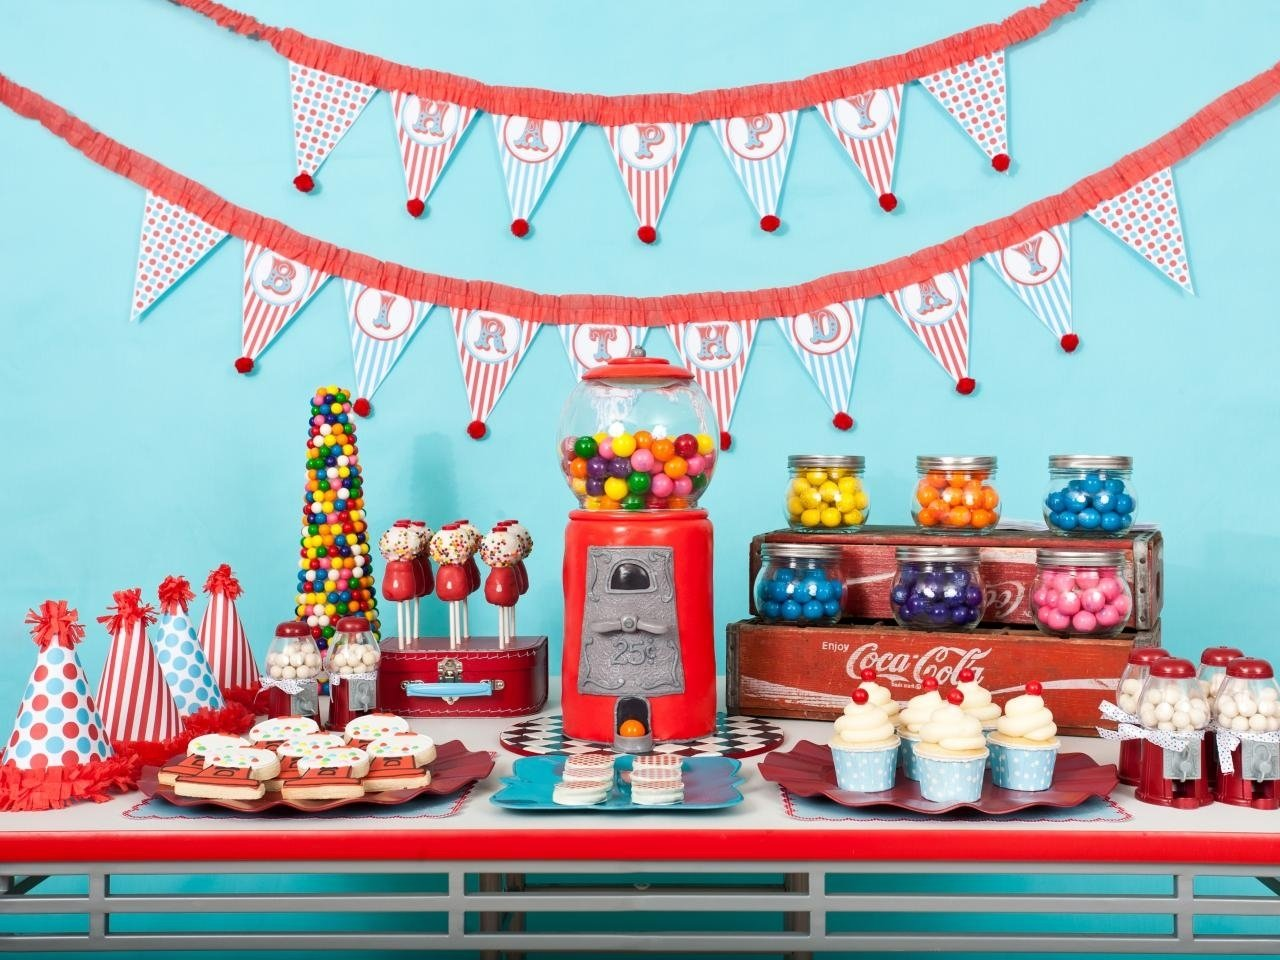 diy favors decorations kids birthday parties entertaining - tierra